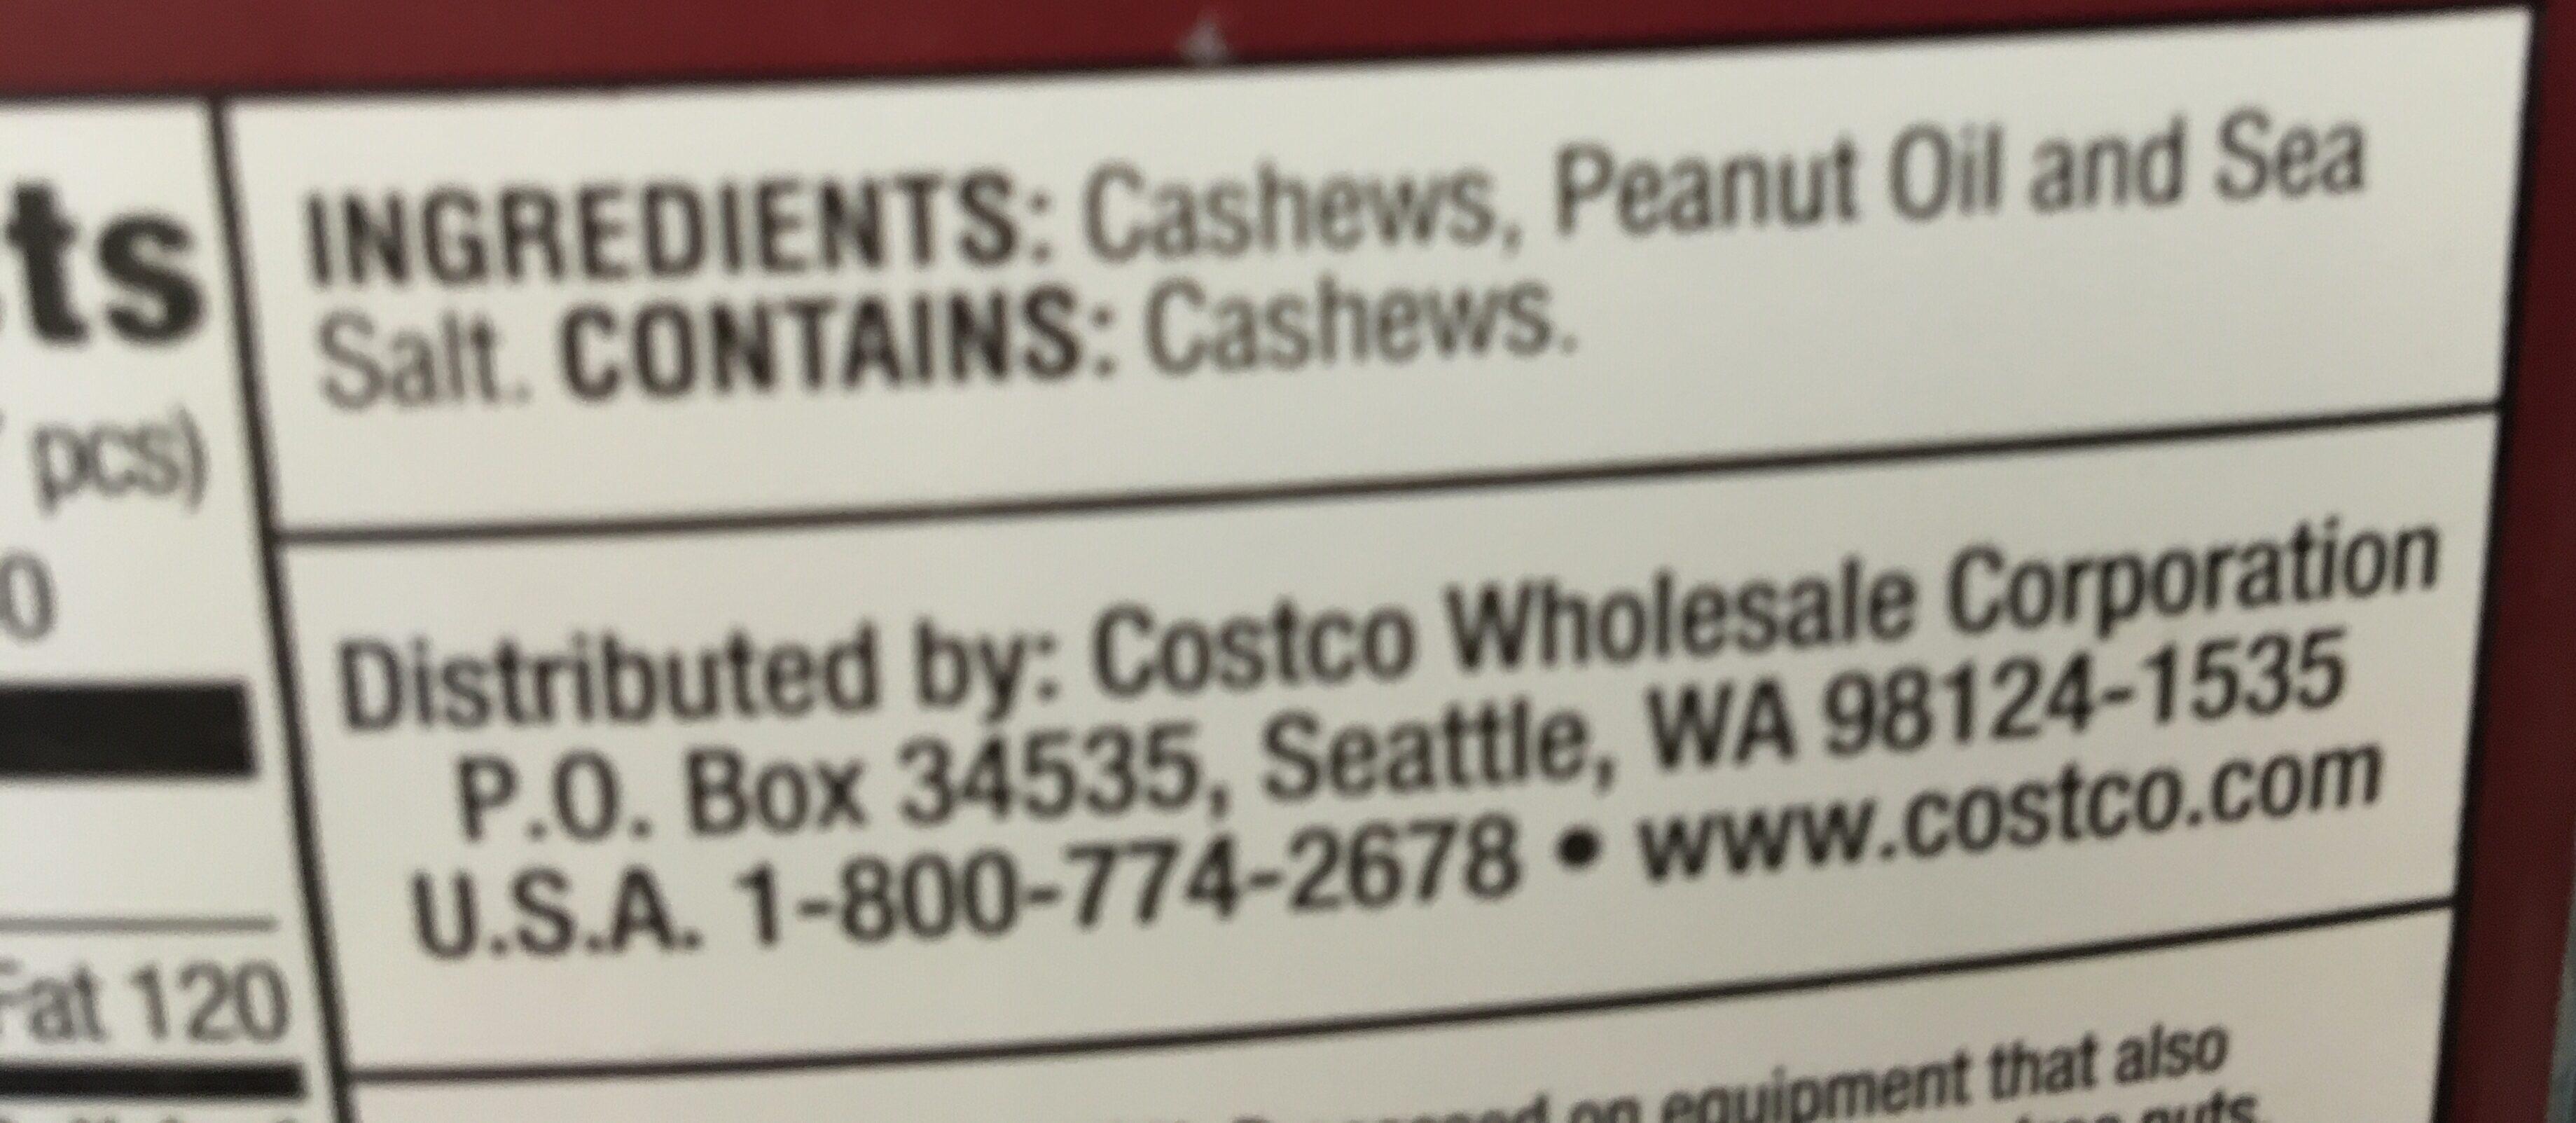 Whole cashews - Ingredients - en